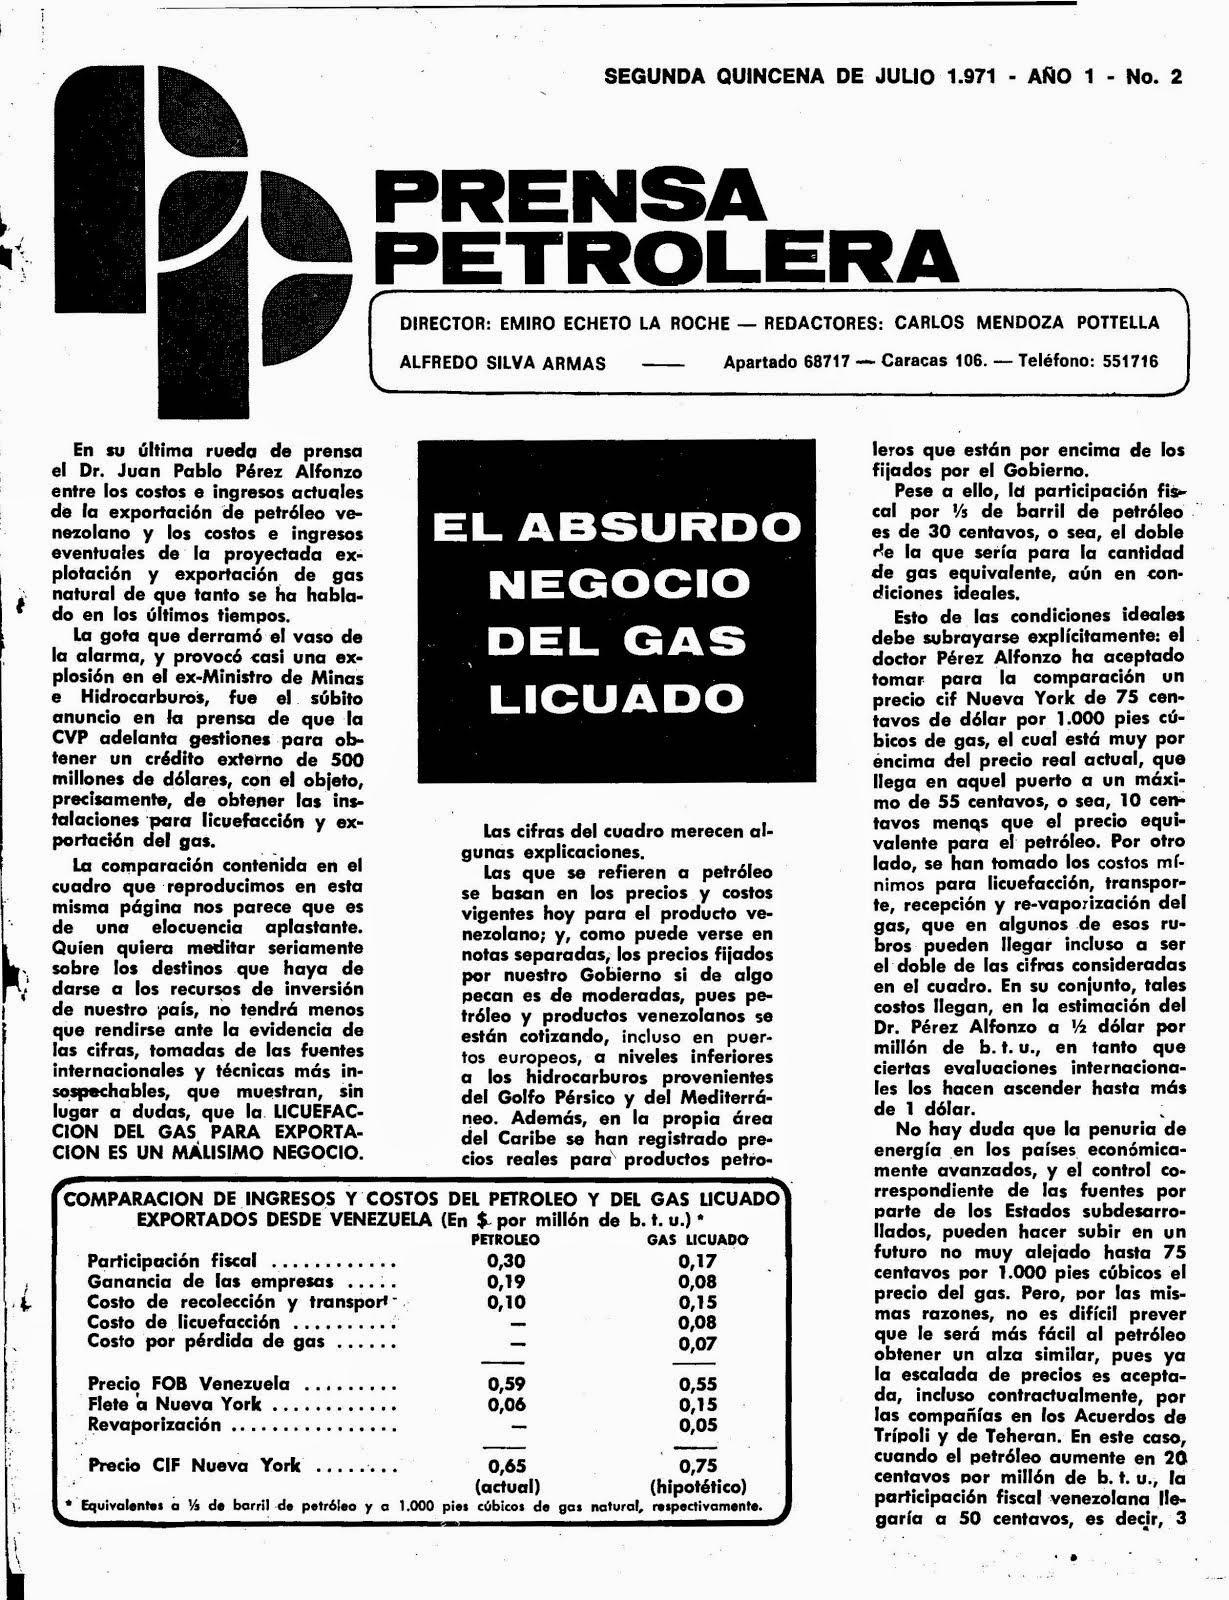 Prensa Petrolera